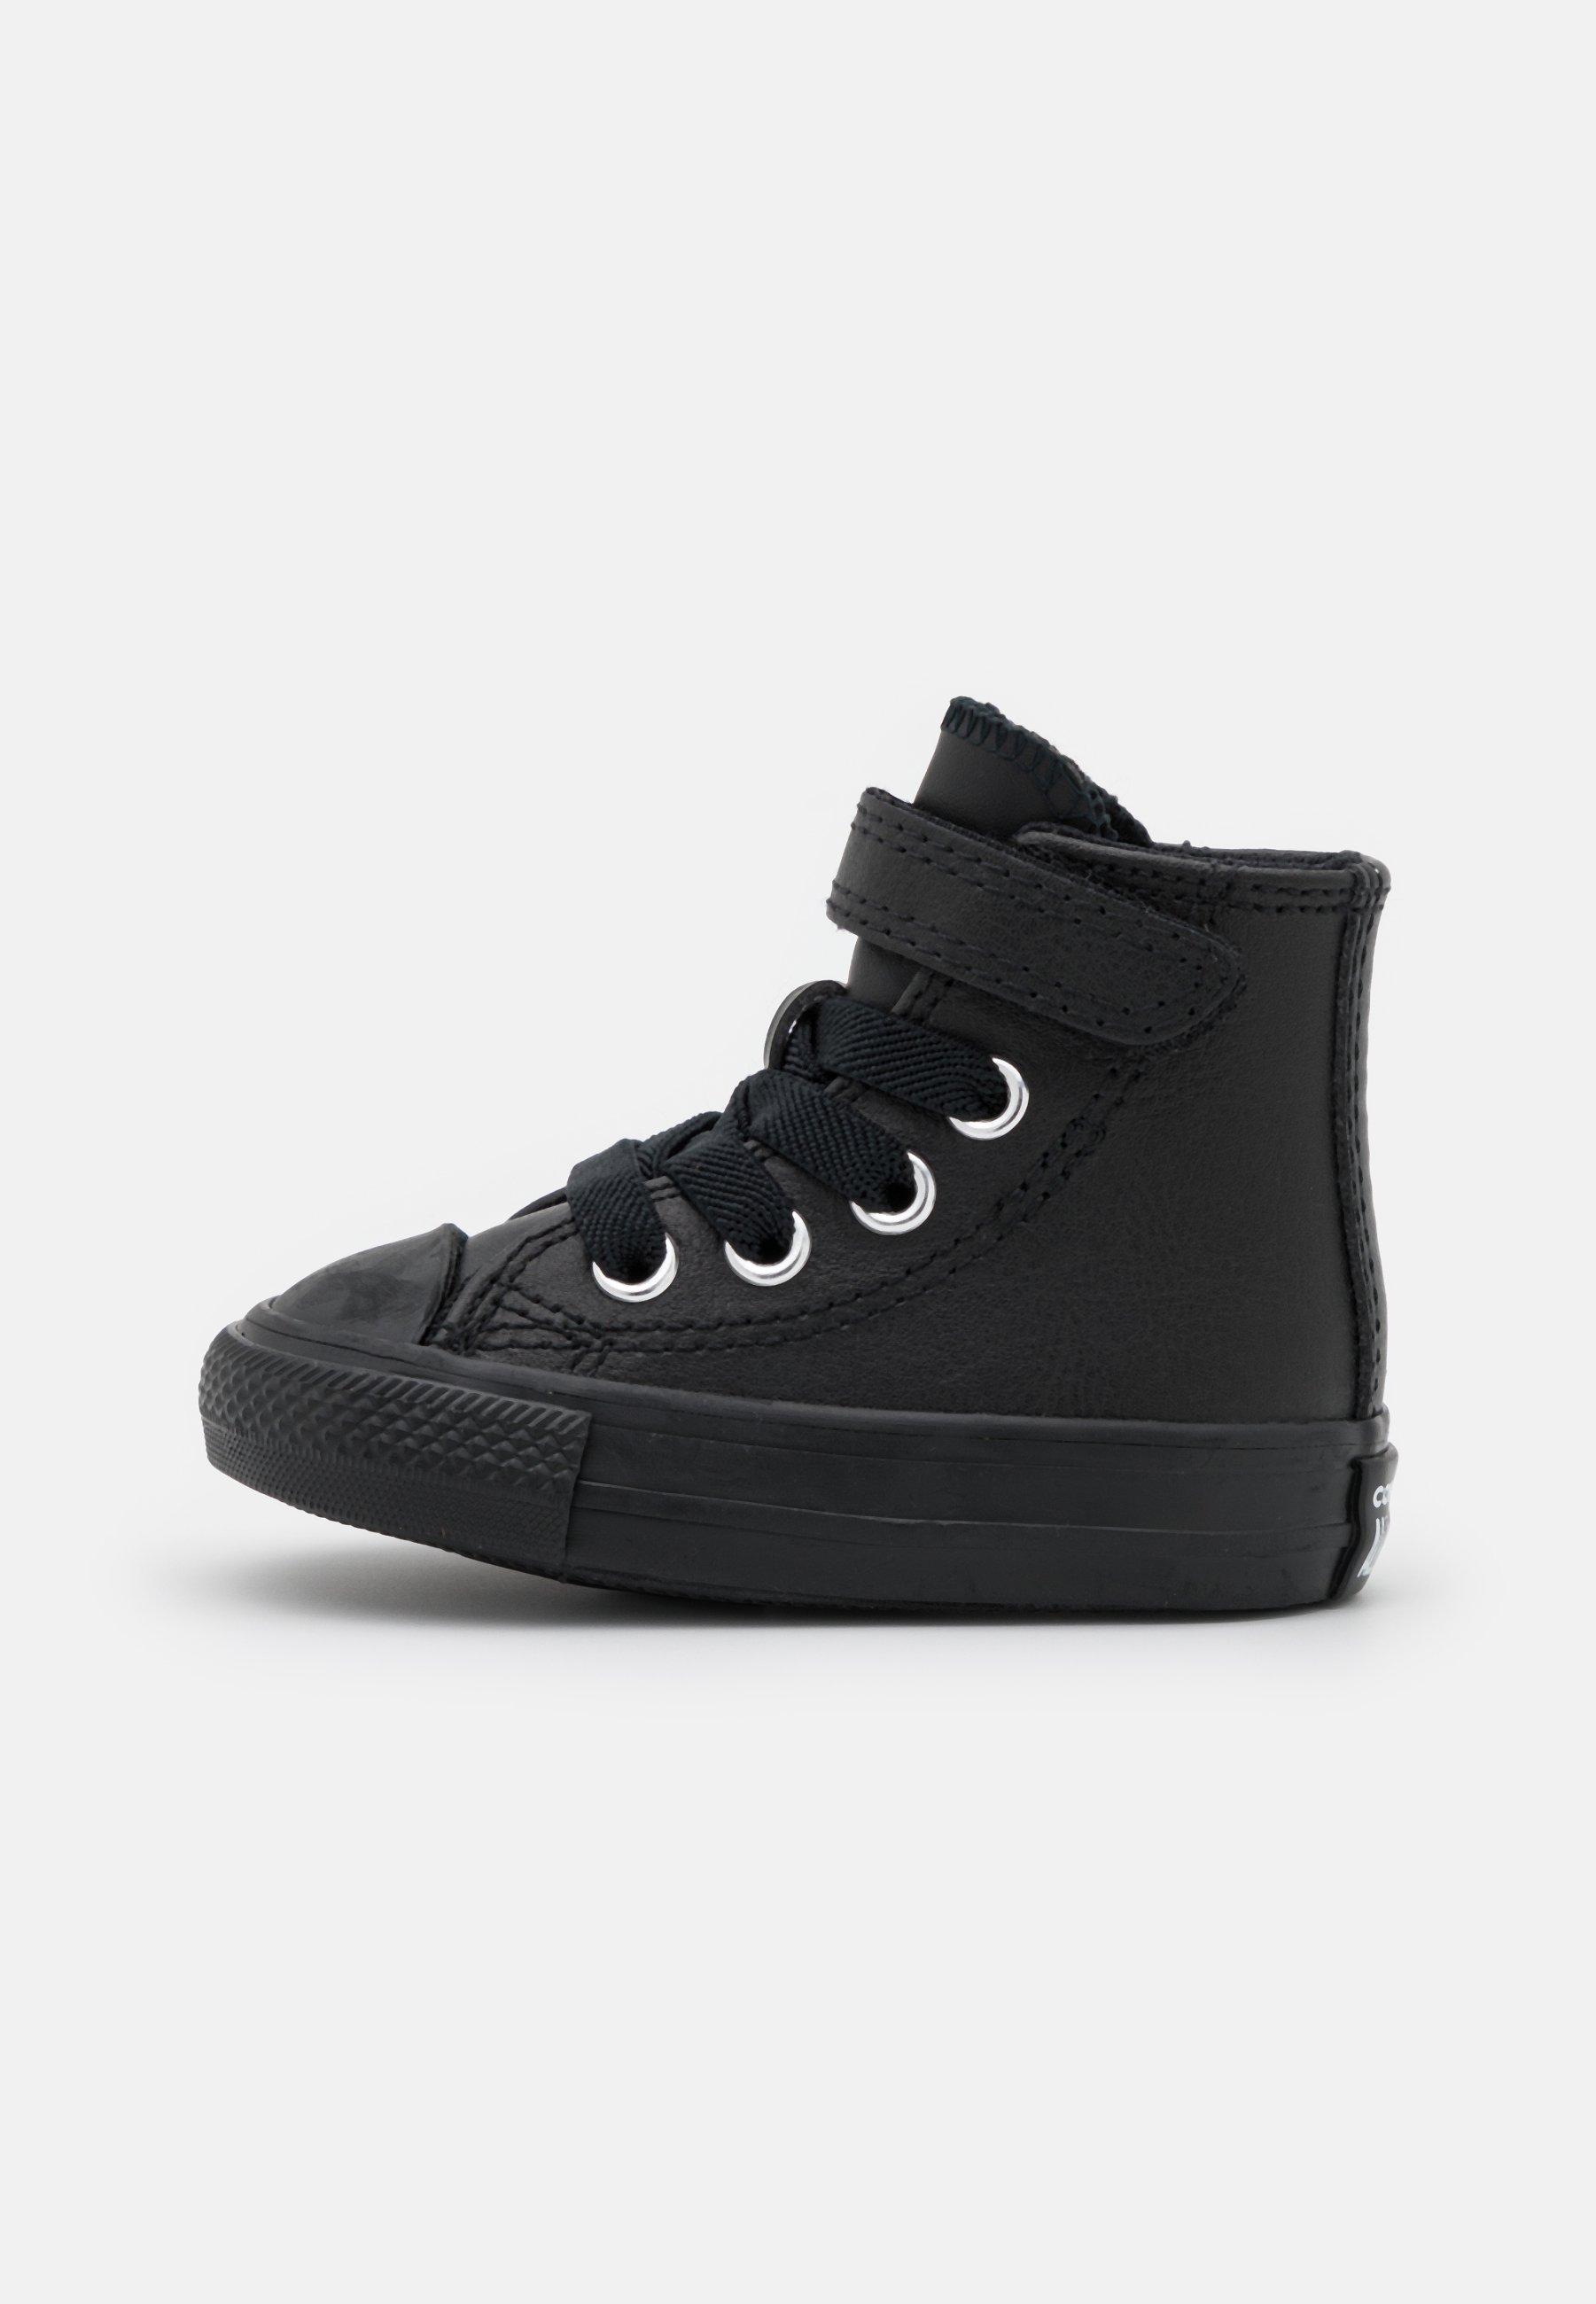 Børn CHUCK TAYLOR ALL STAR UNISEX - Sneakers high